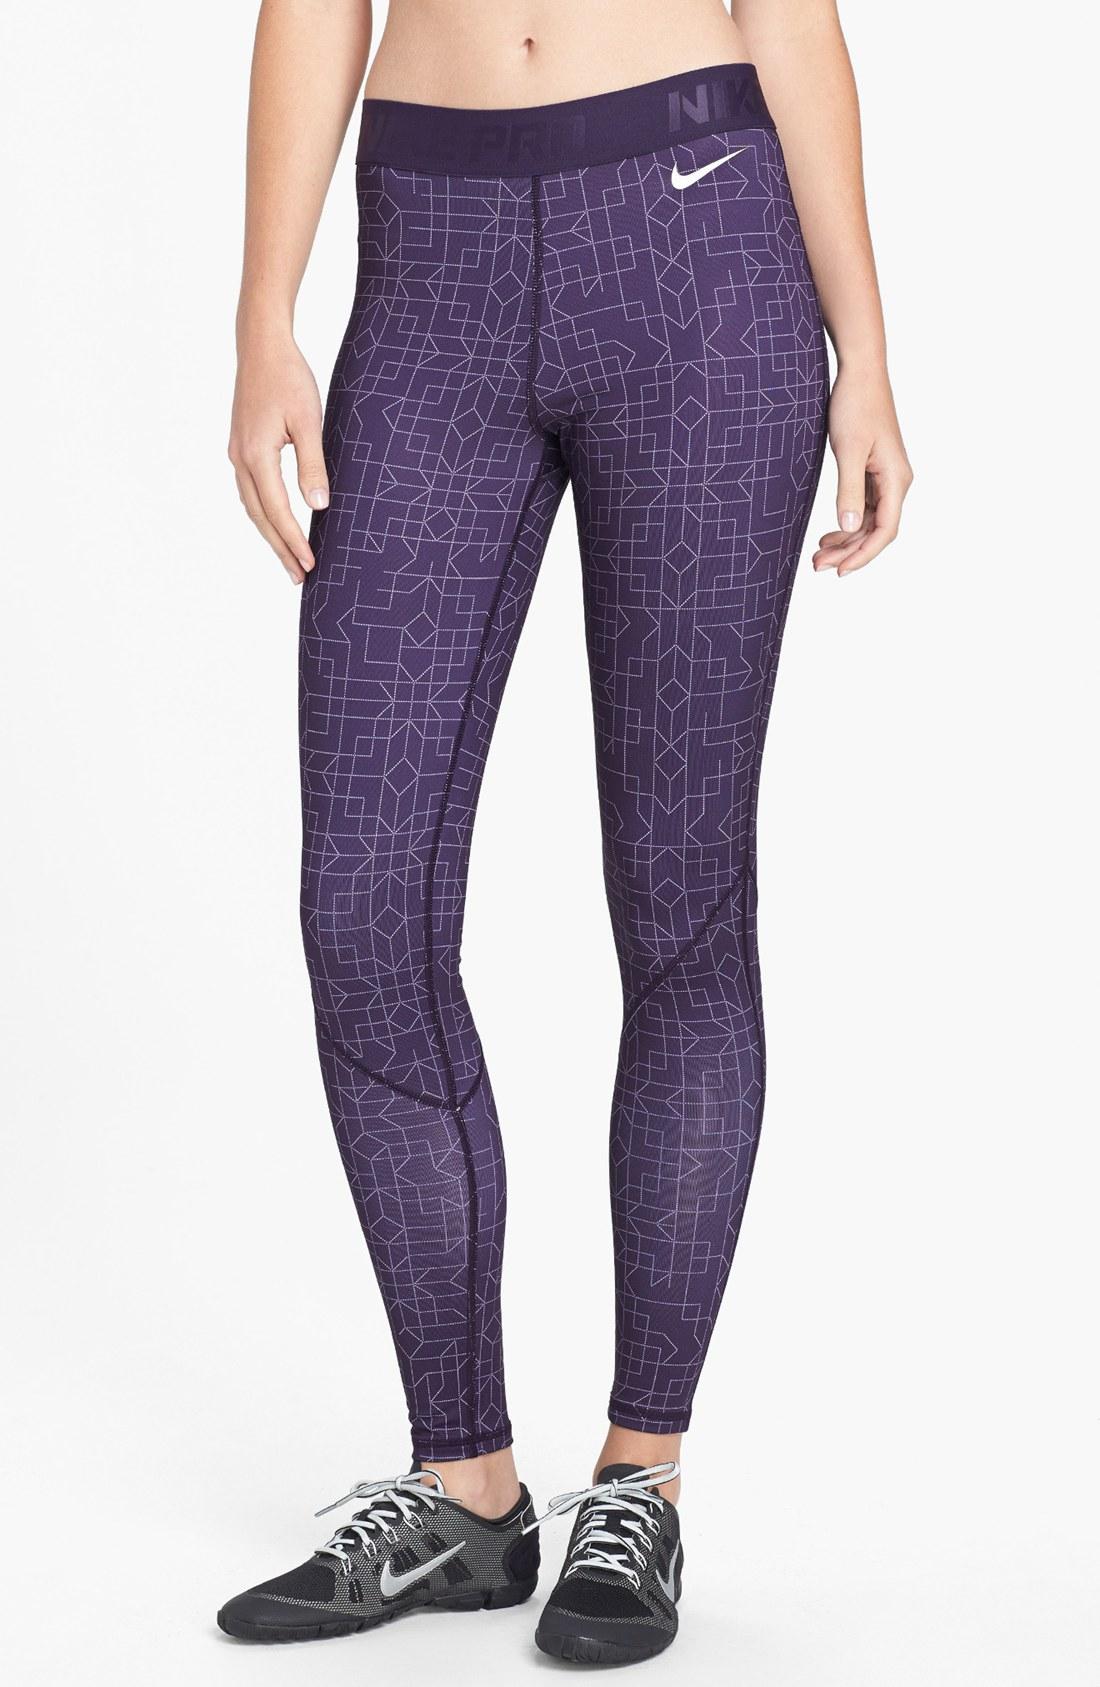 nike pro hyperwarm tights in purple purple dynasty. Black Bedroom Furniture Sets. Home Design Ideas